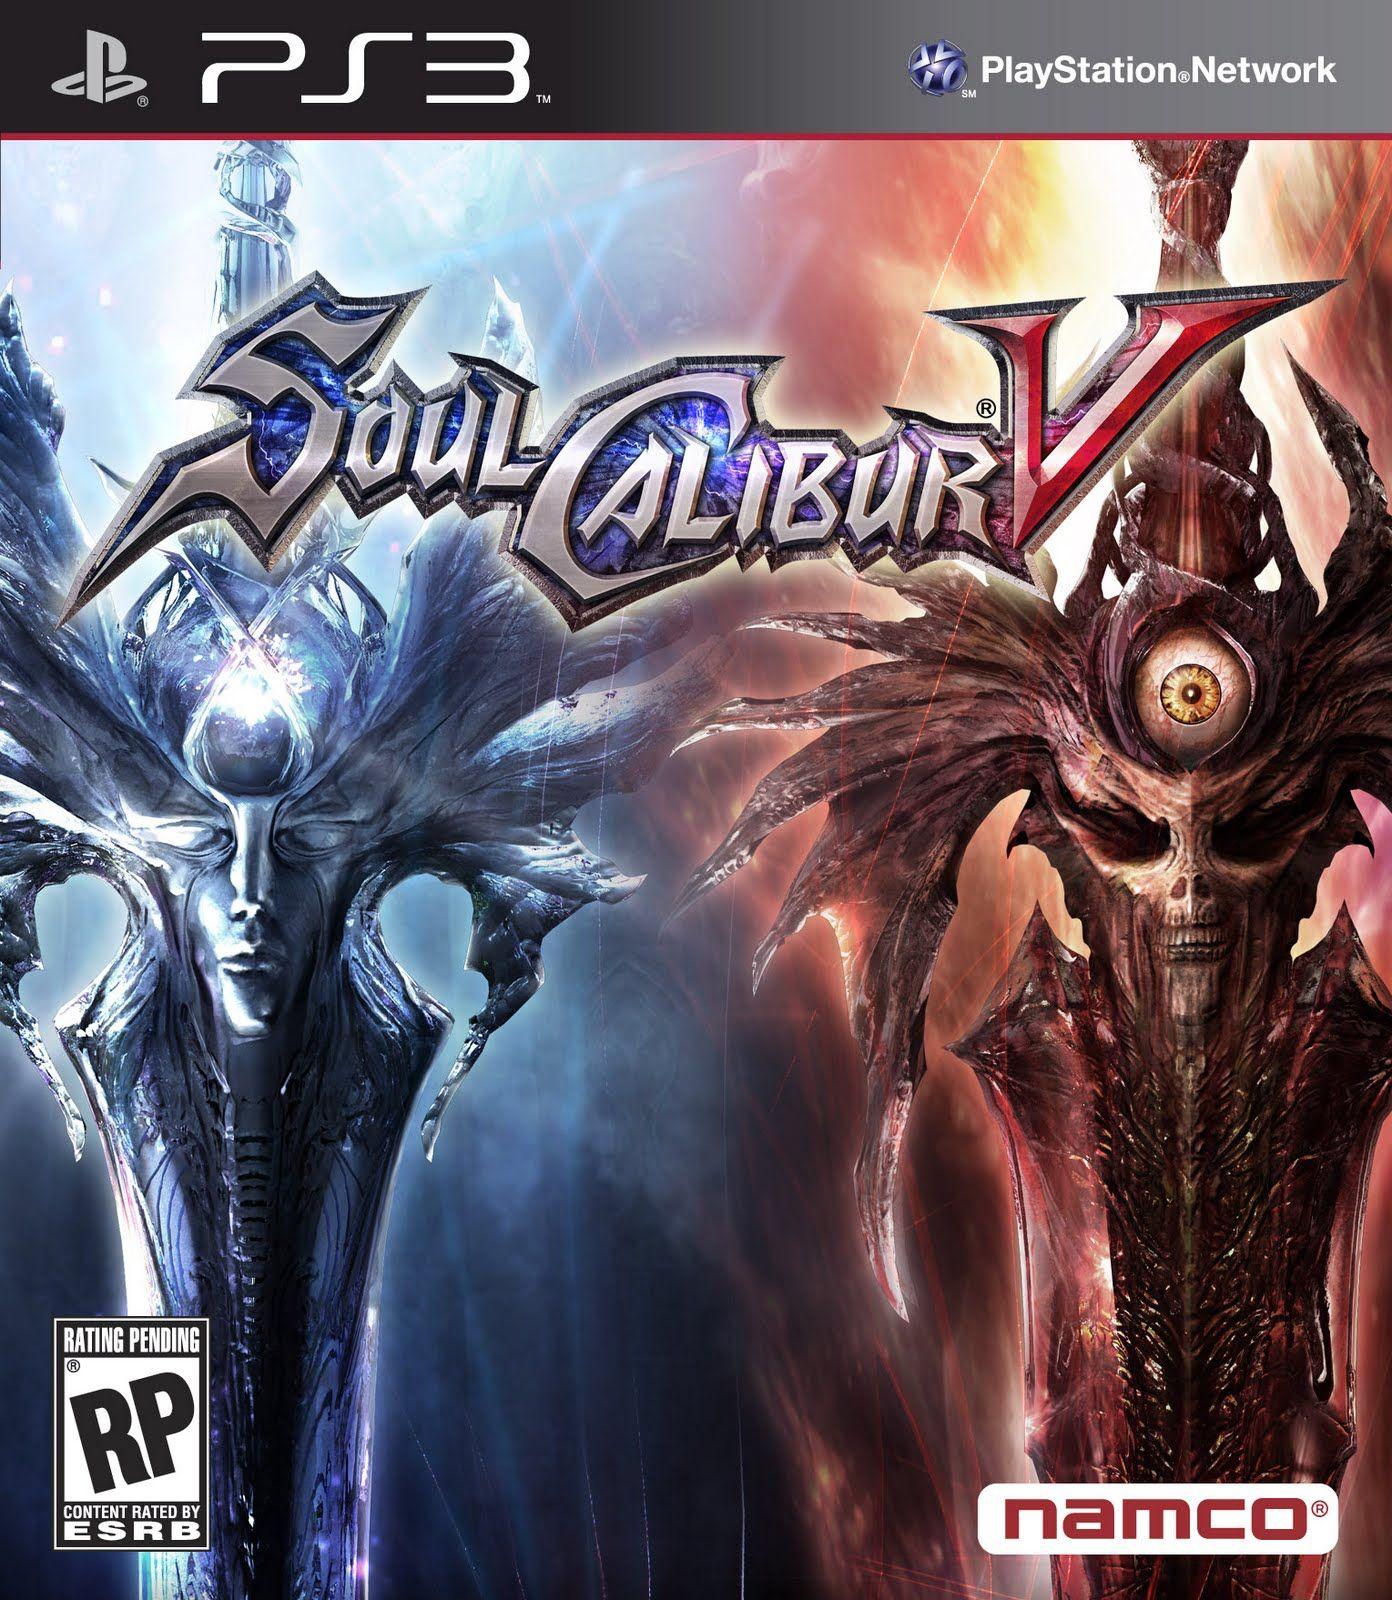 Games Movies Music Anime Soul Calibur 5 Ps3 Box Art Soul